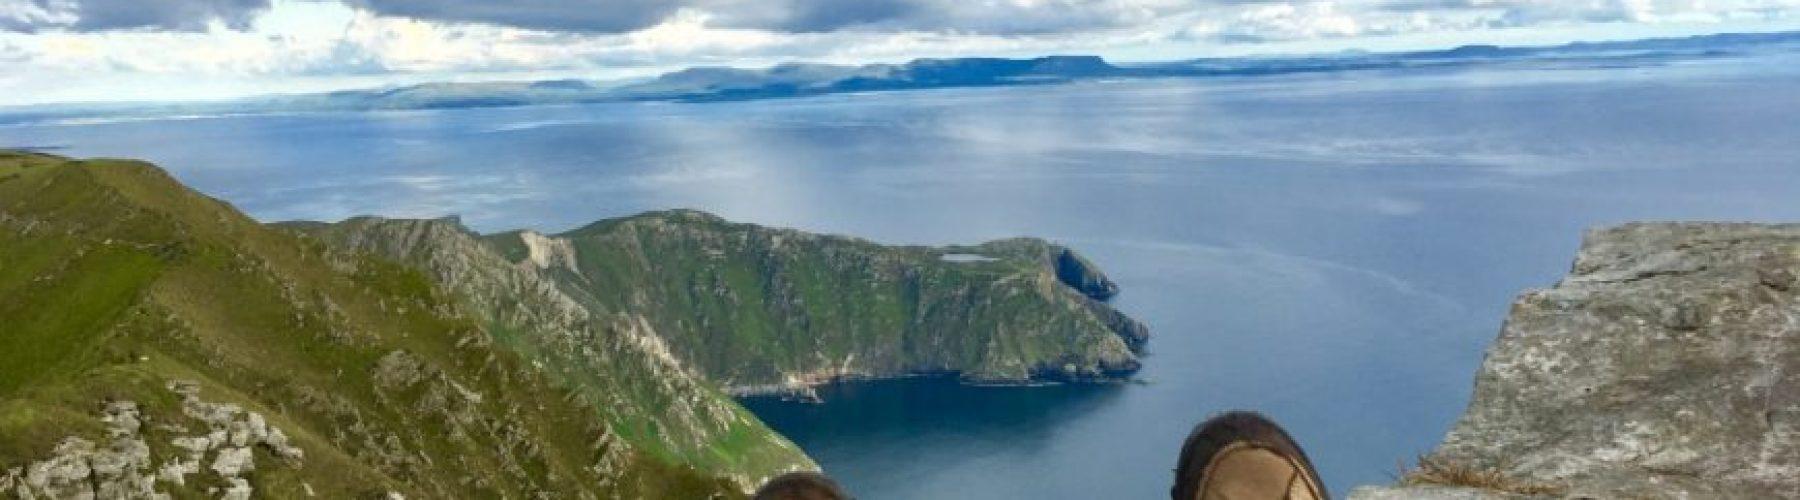 Walking on Sliabh Liag with Ireland by Bike